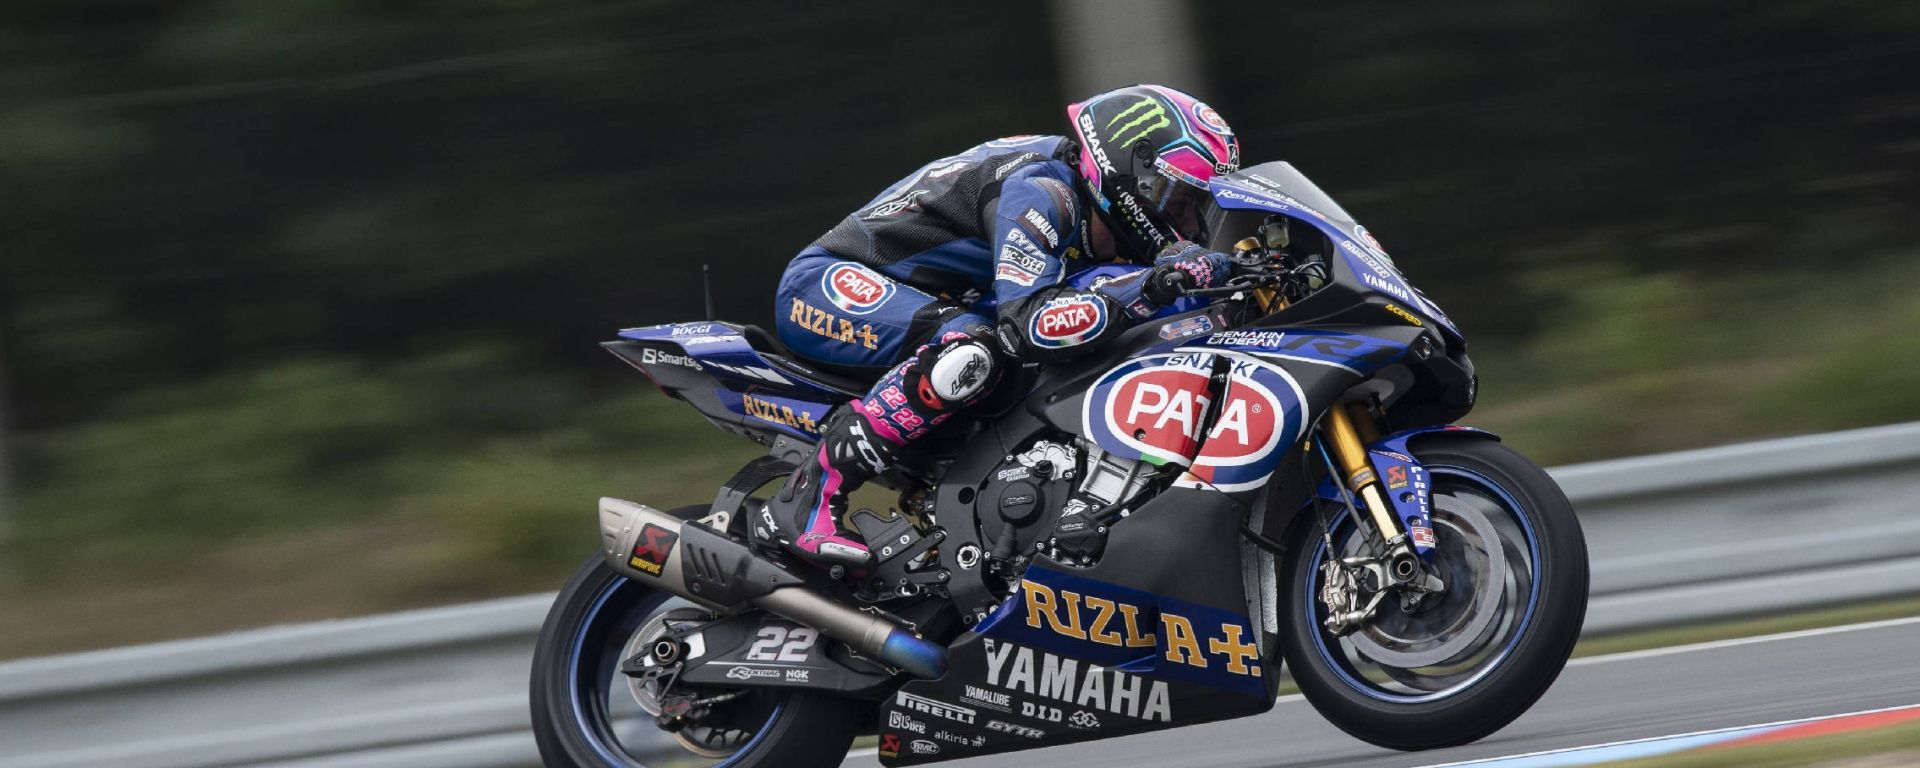 Sbk Brnò 2018: Yamaha fa doppietta, in gara due vince Lowes